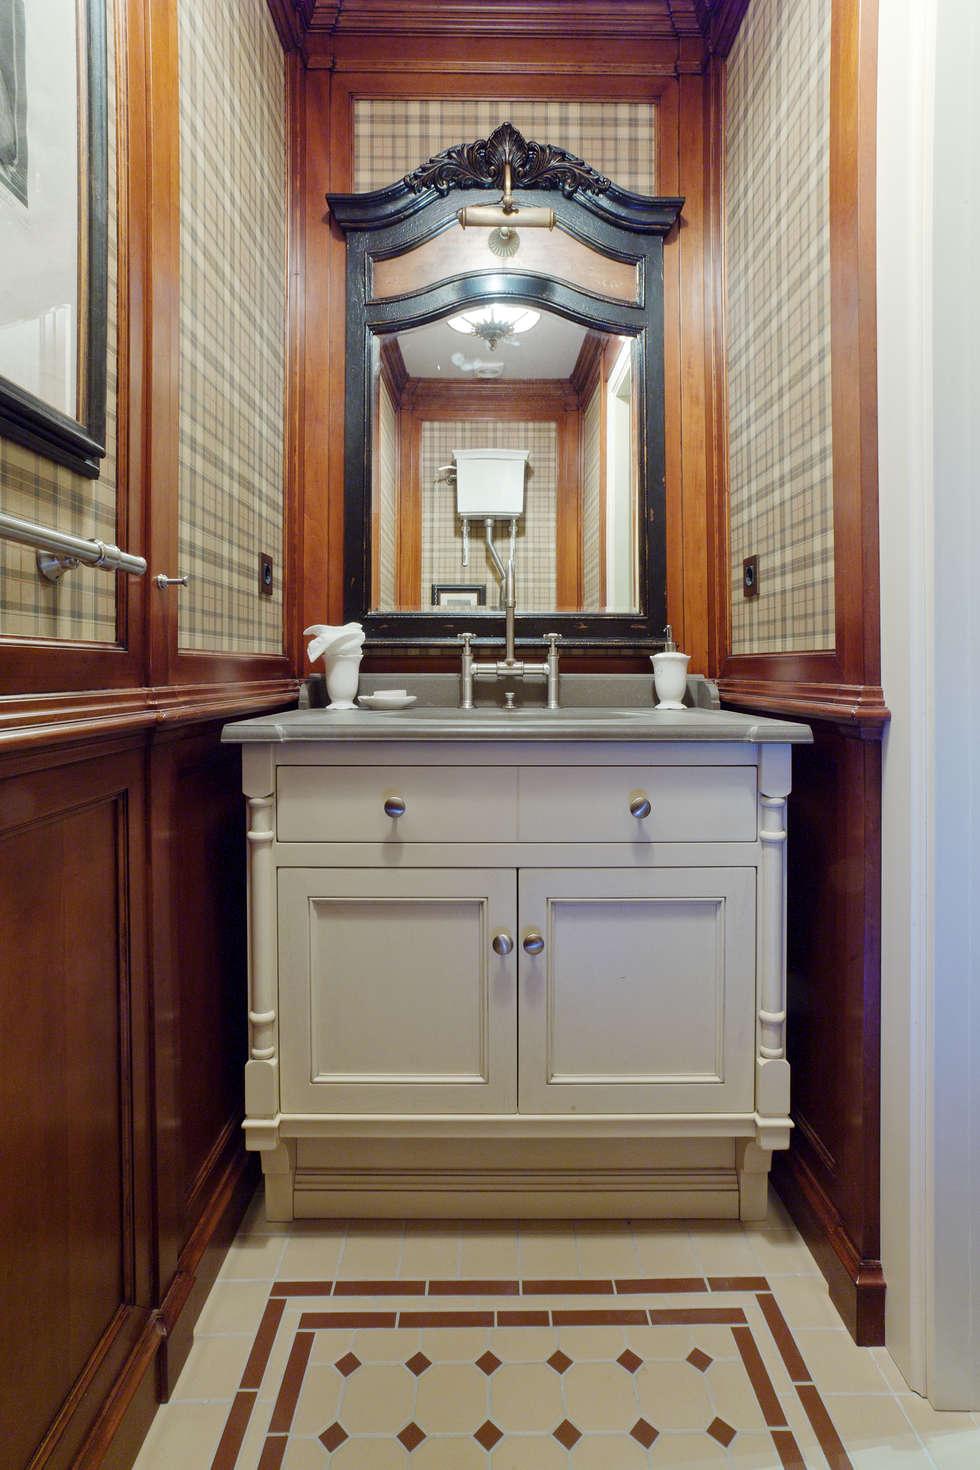 The apartment in Moscow 01: Salle de bains de style  par Petr Kozeykin Designs LLC, 'PS Pierreswatch'